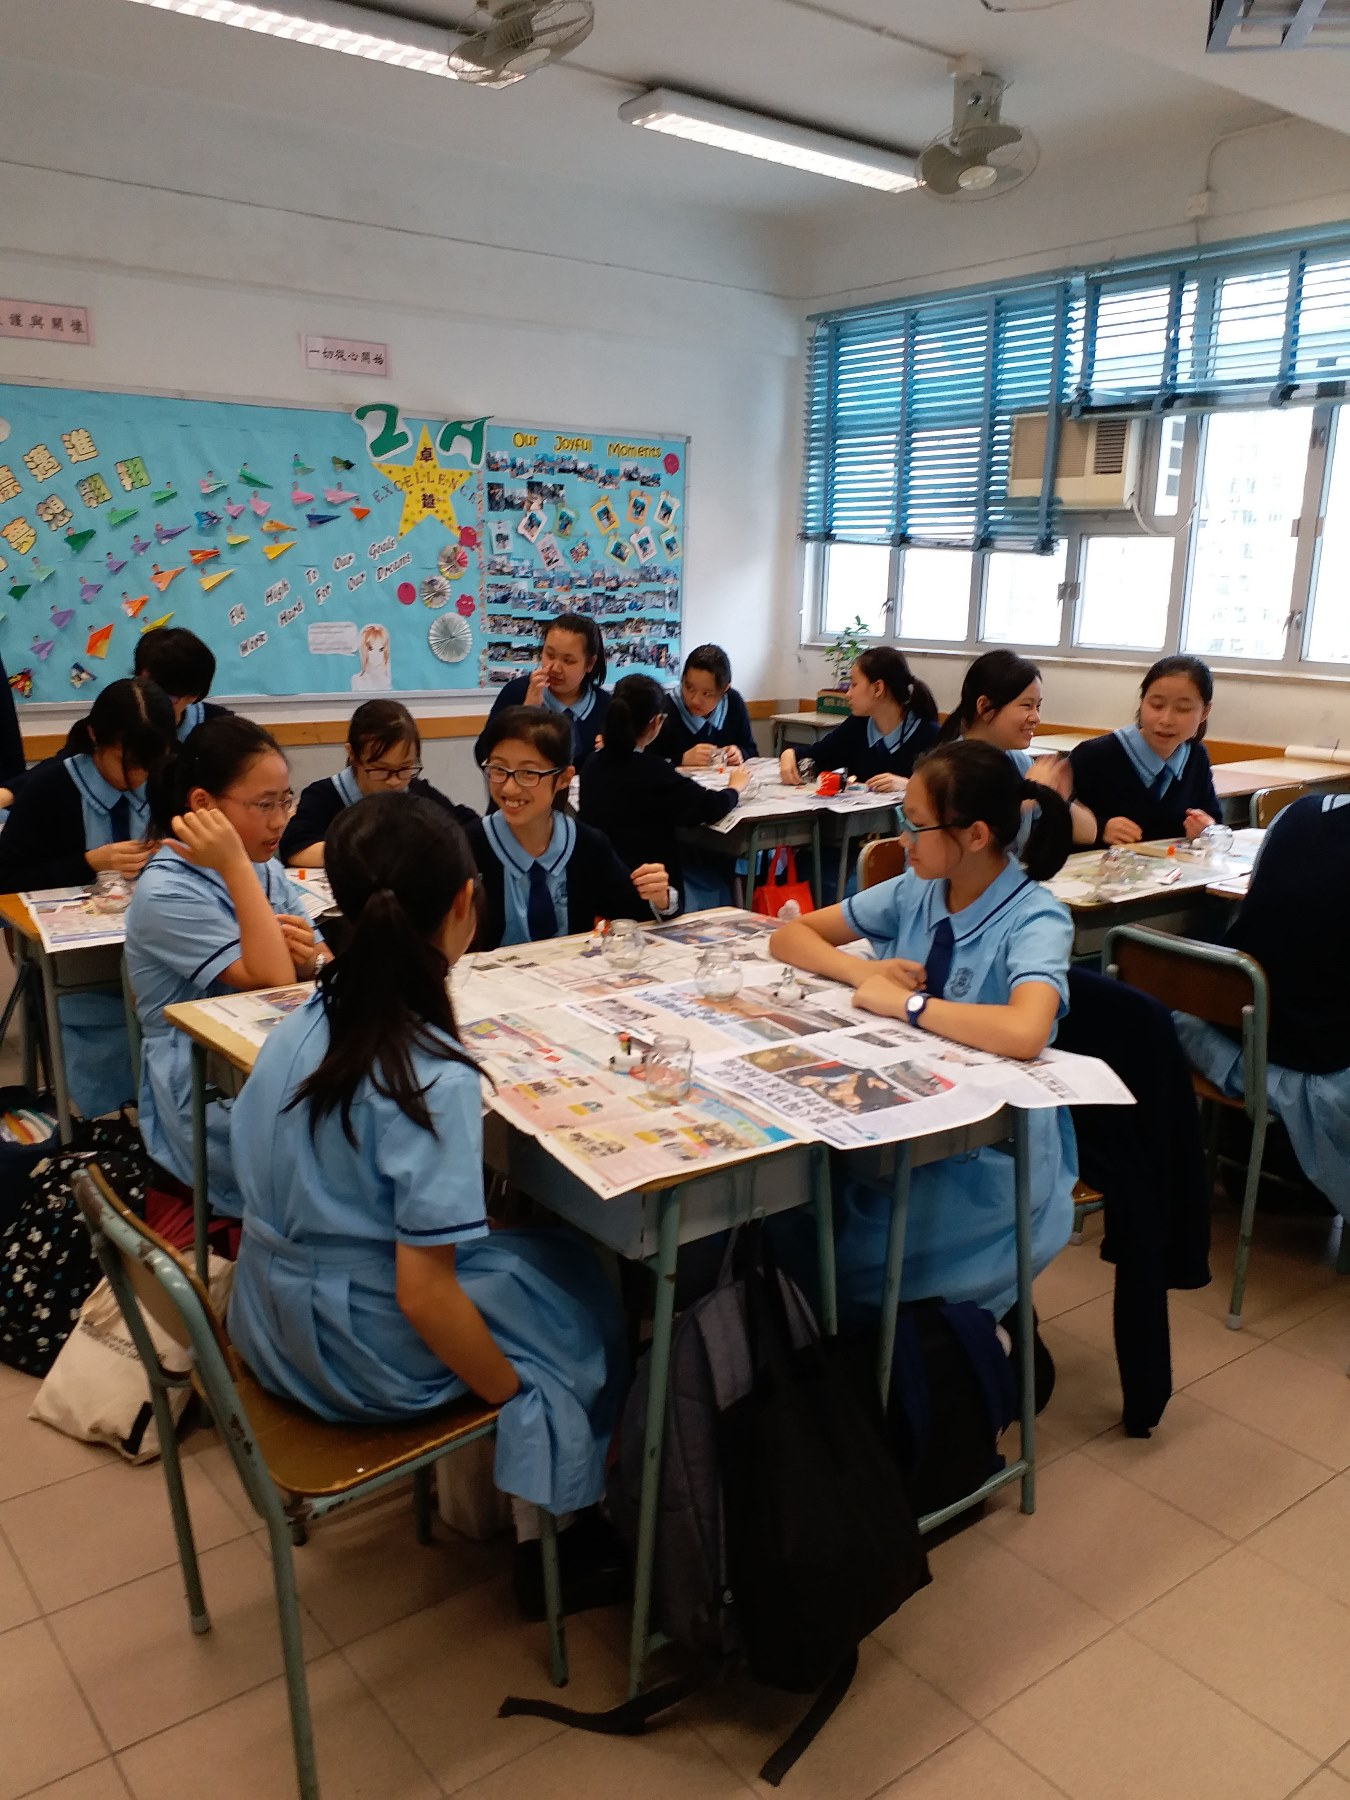 http://www.npc.edu.hk/sites/default/files/20180511_162626.jpg